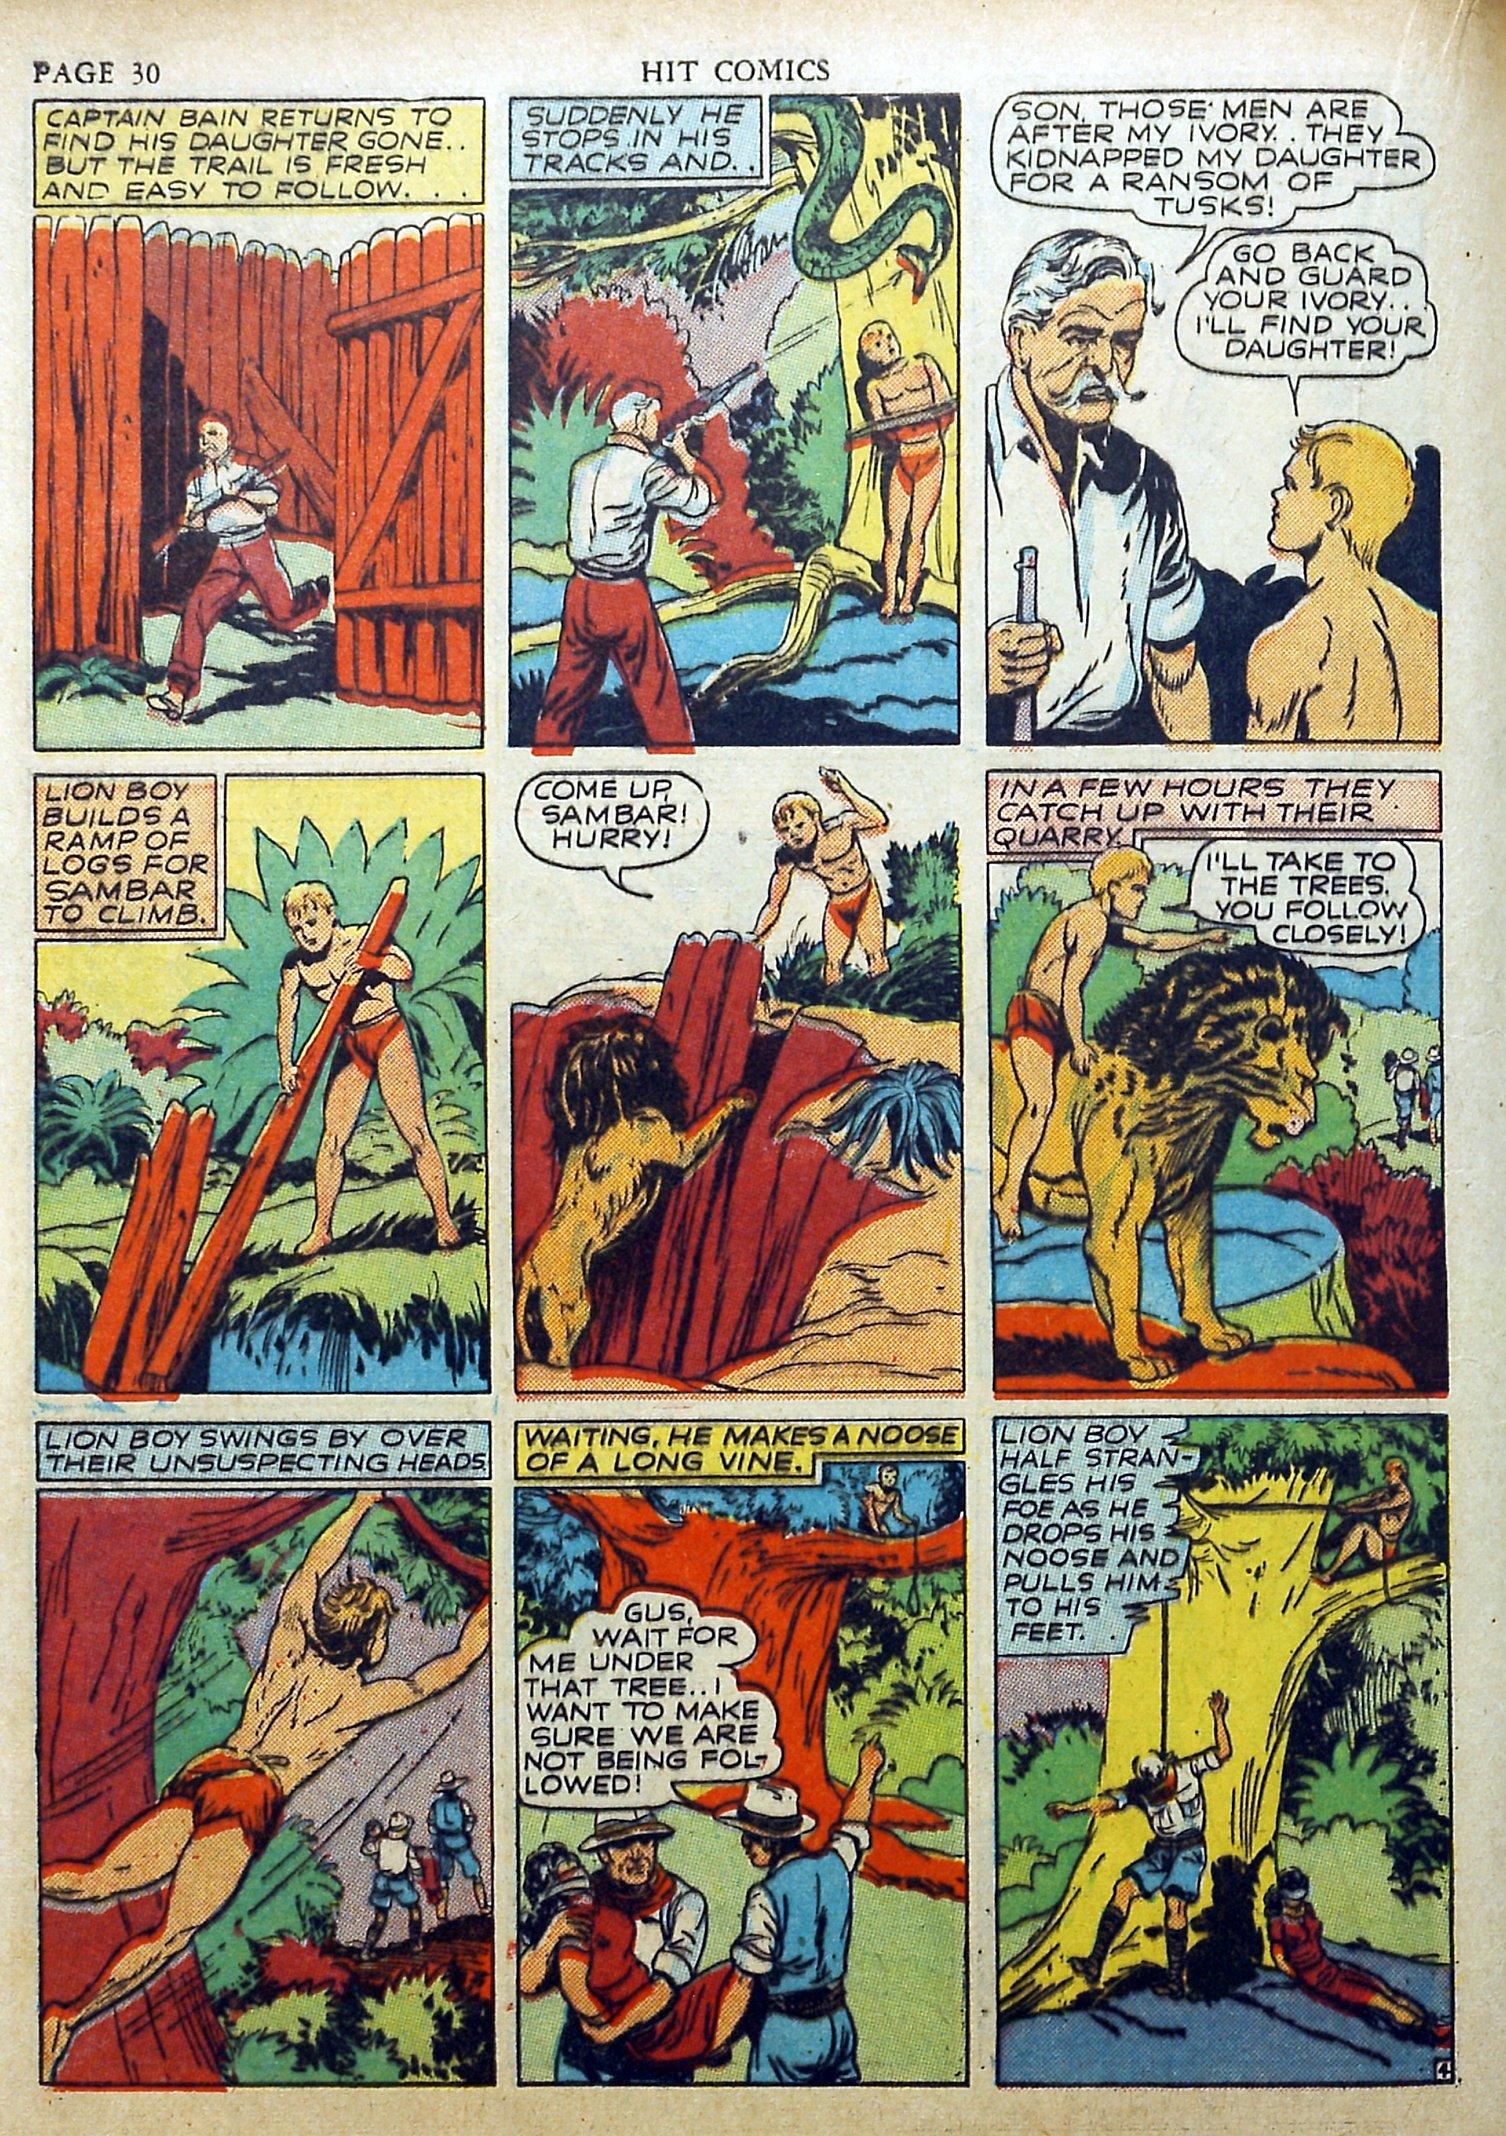 Read online Hit Comics comic -  Issue #17 - 32